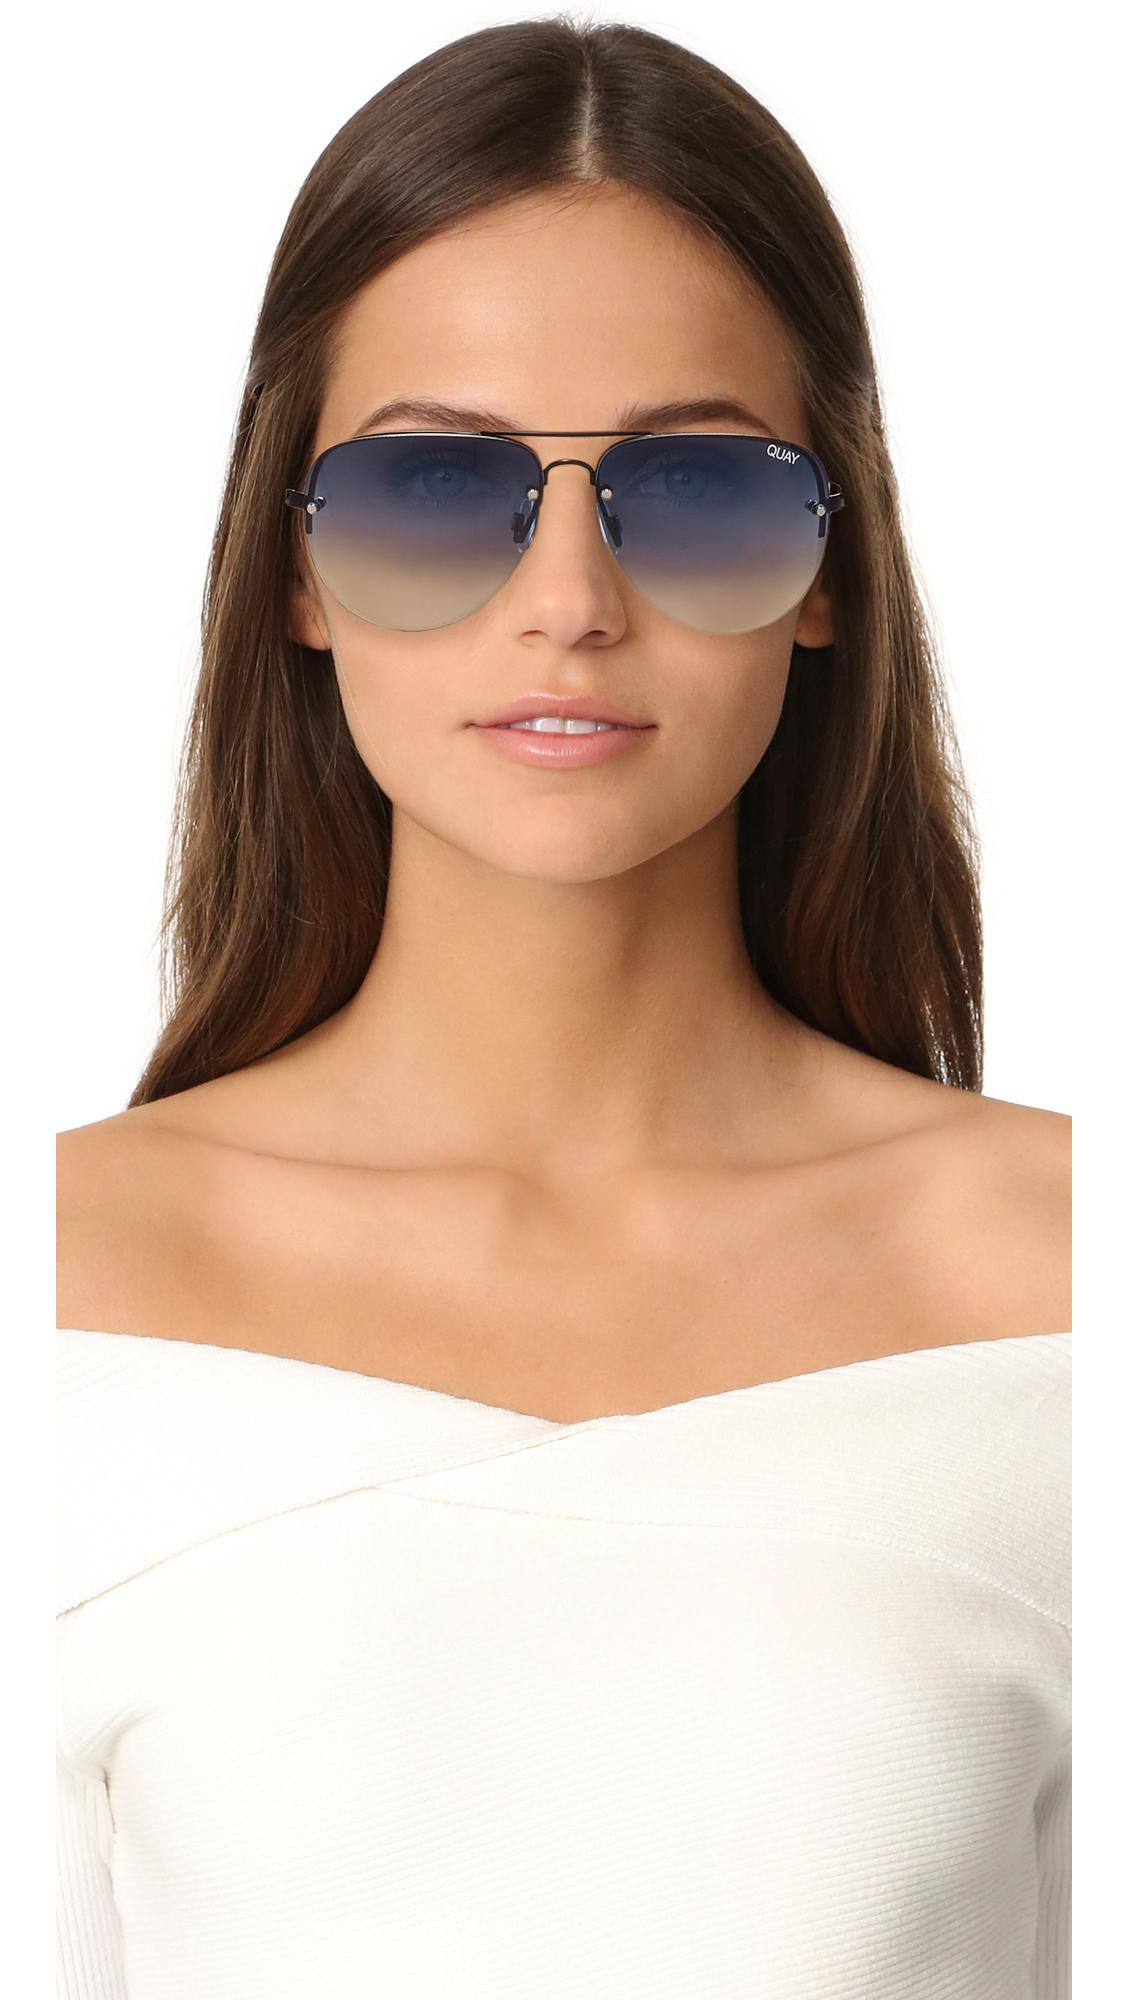 2810f39d4dae8 Quay Muse Fade Sunglasses